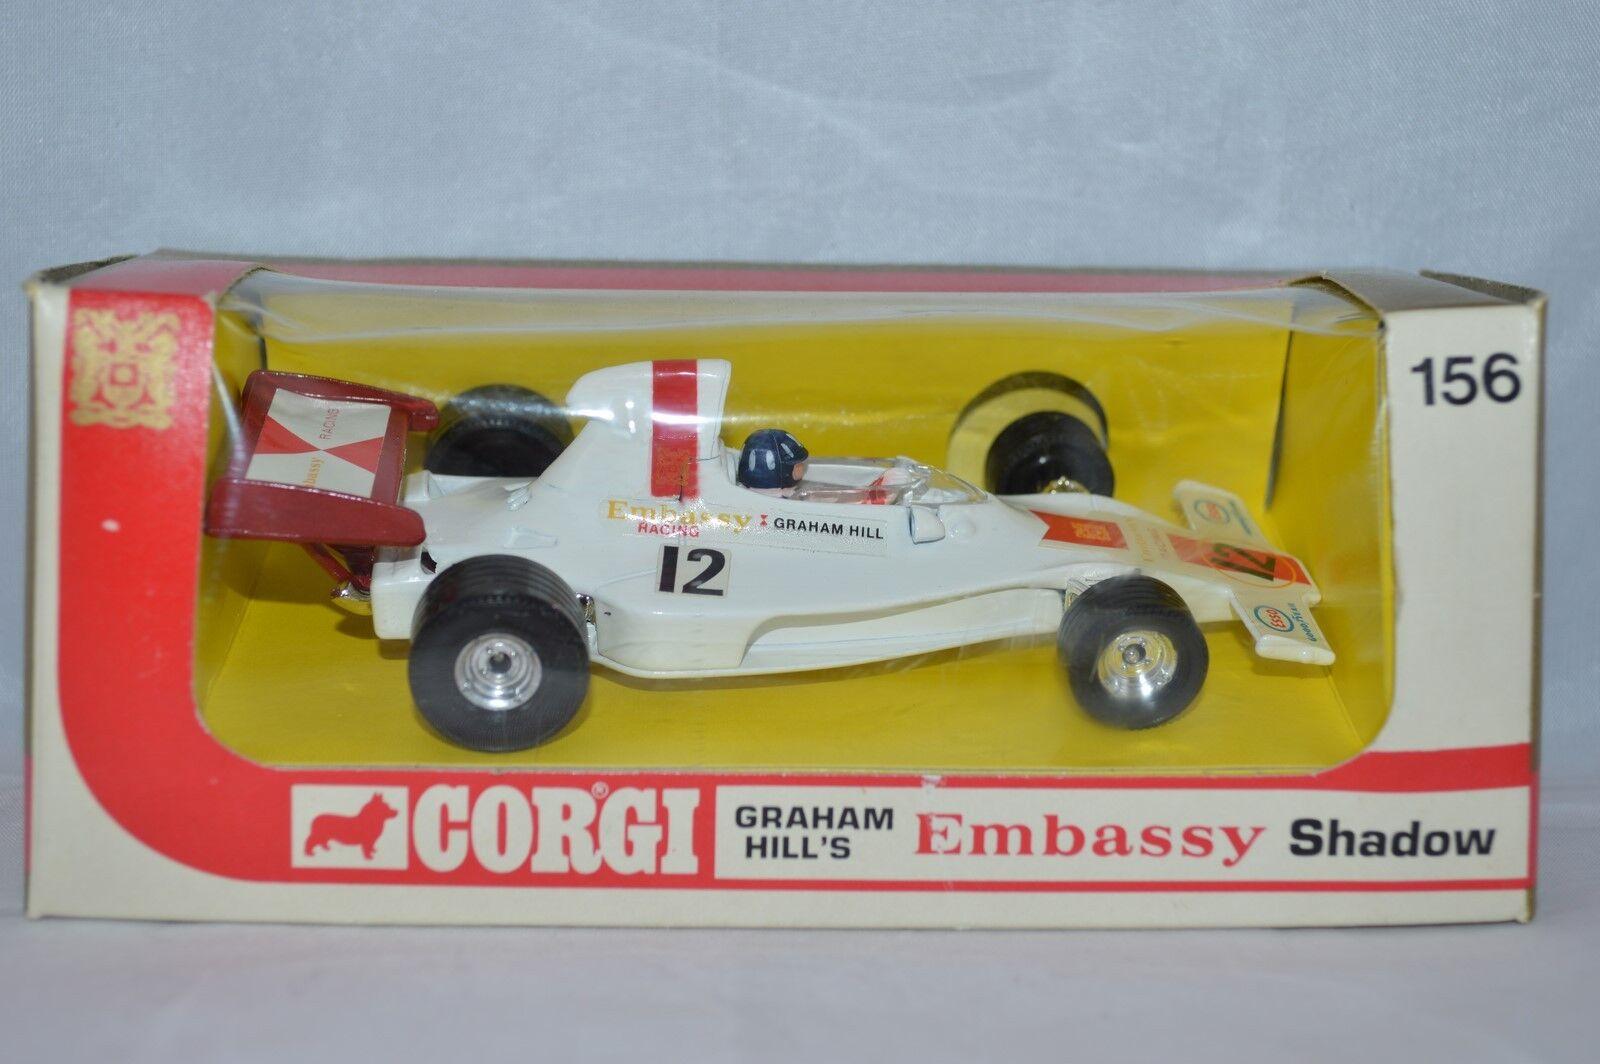 Corgi Toys 156 156 156 Graham Hill's Embassy Shad perfect mint in box original condition 97c7e6